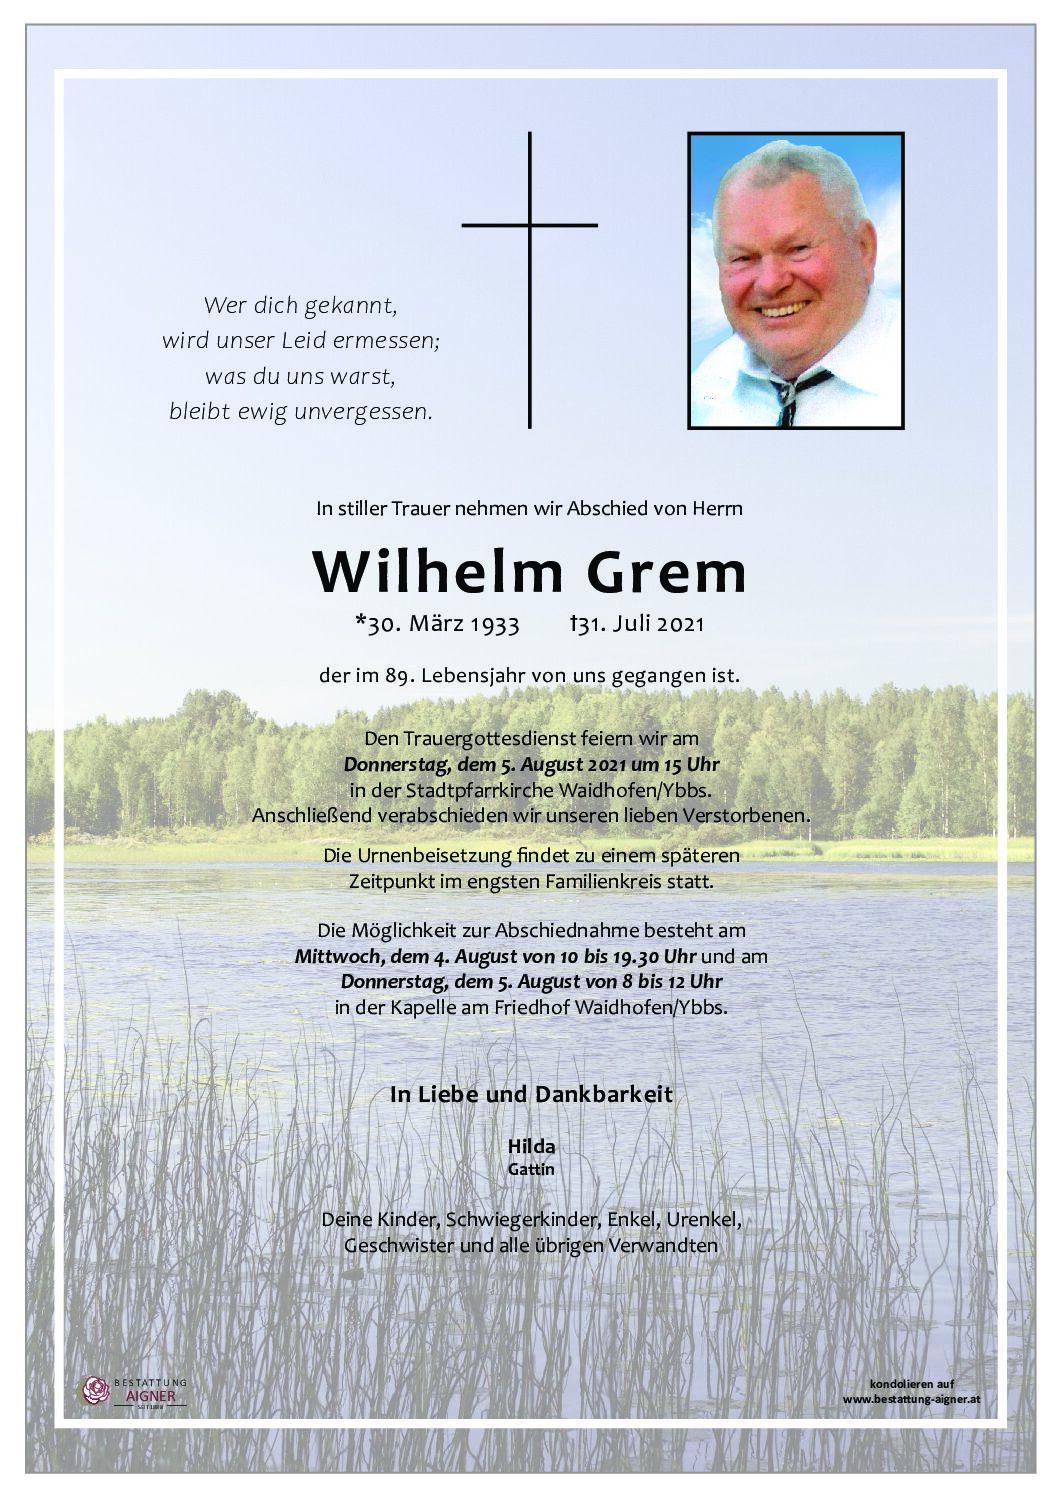 Wilhelm Grem